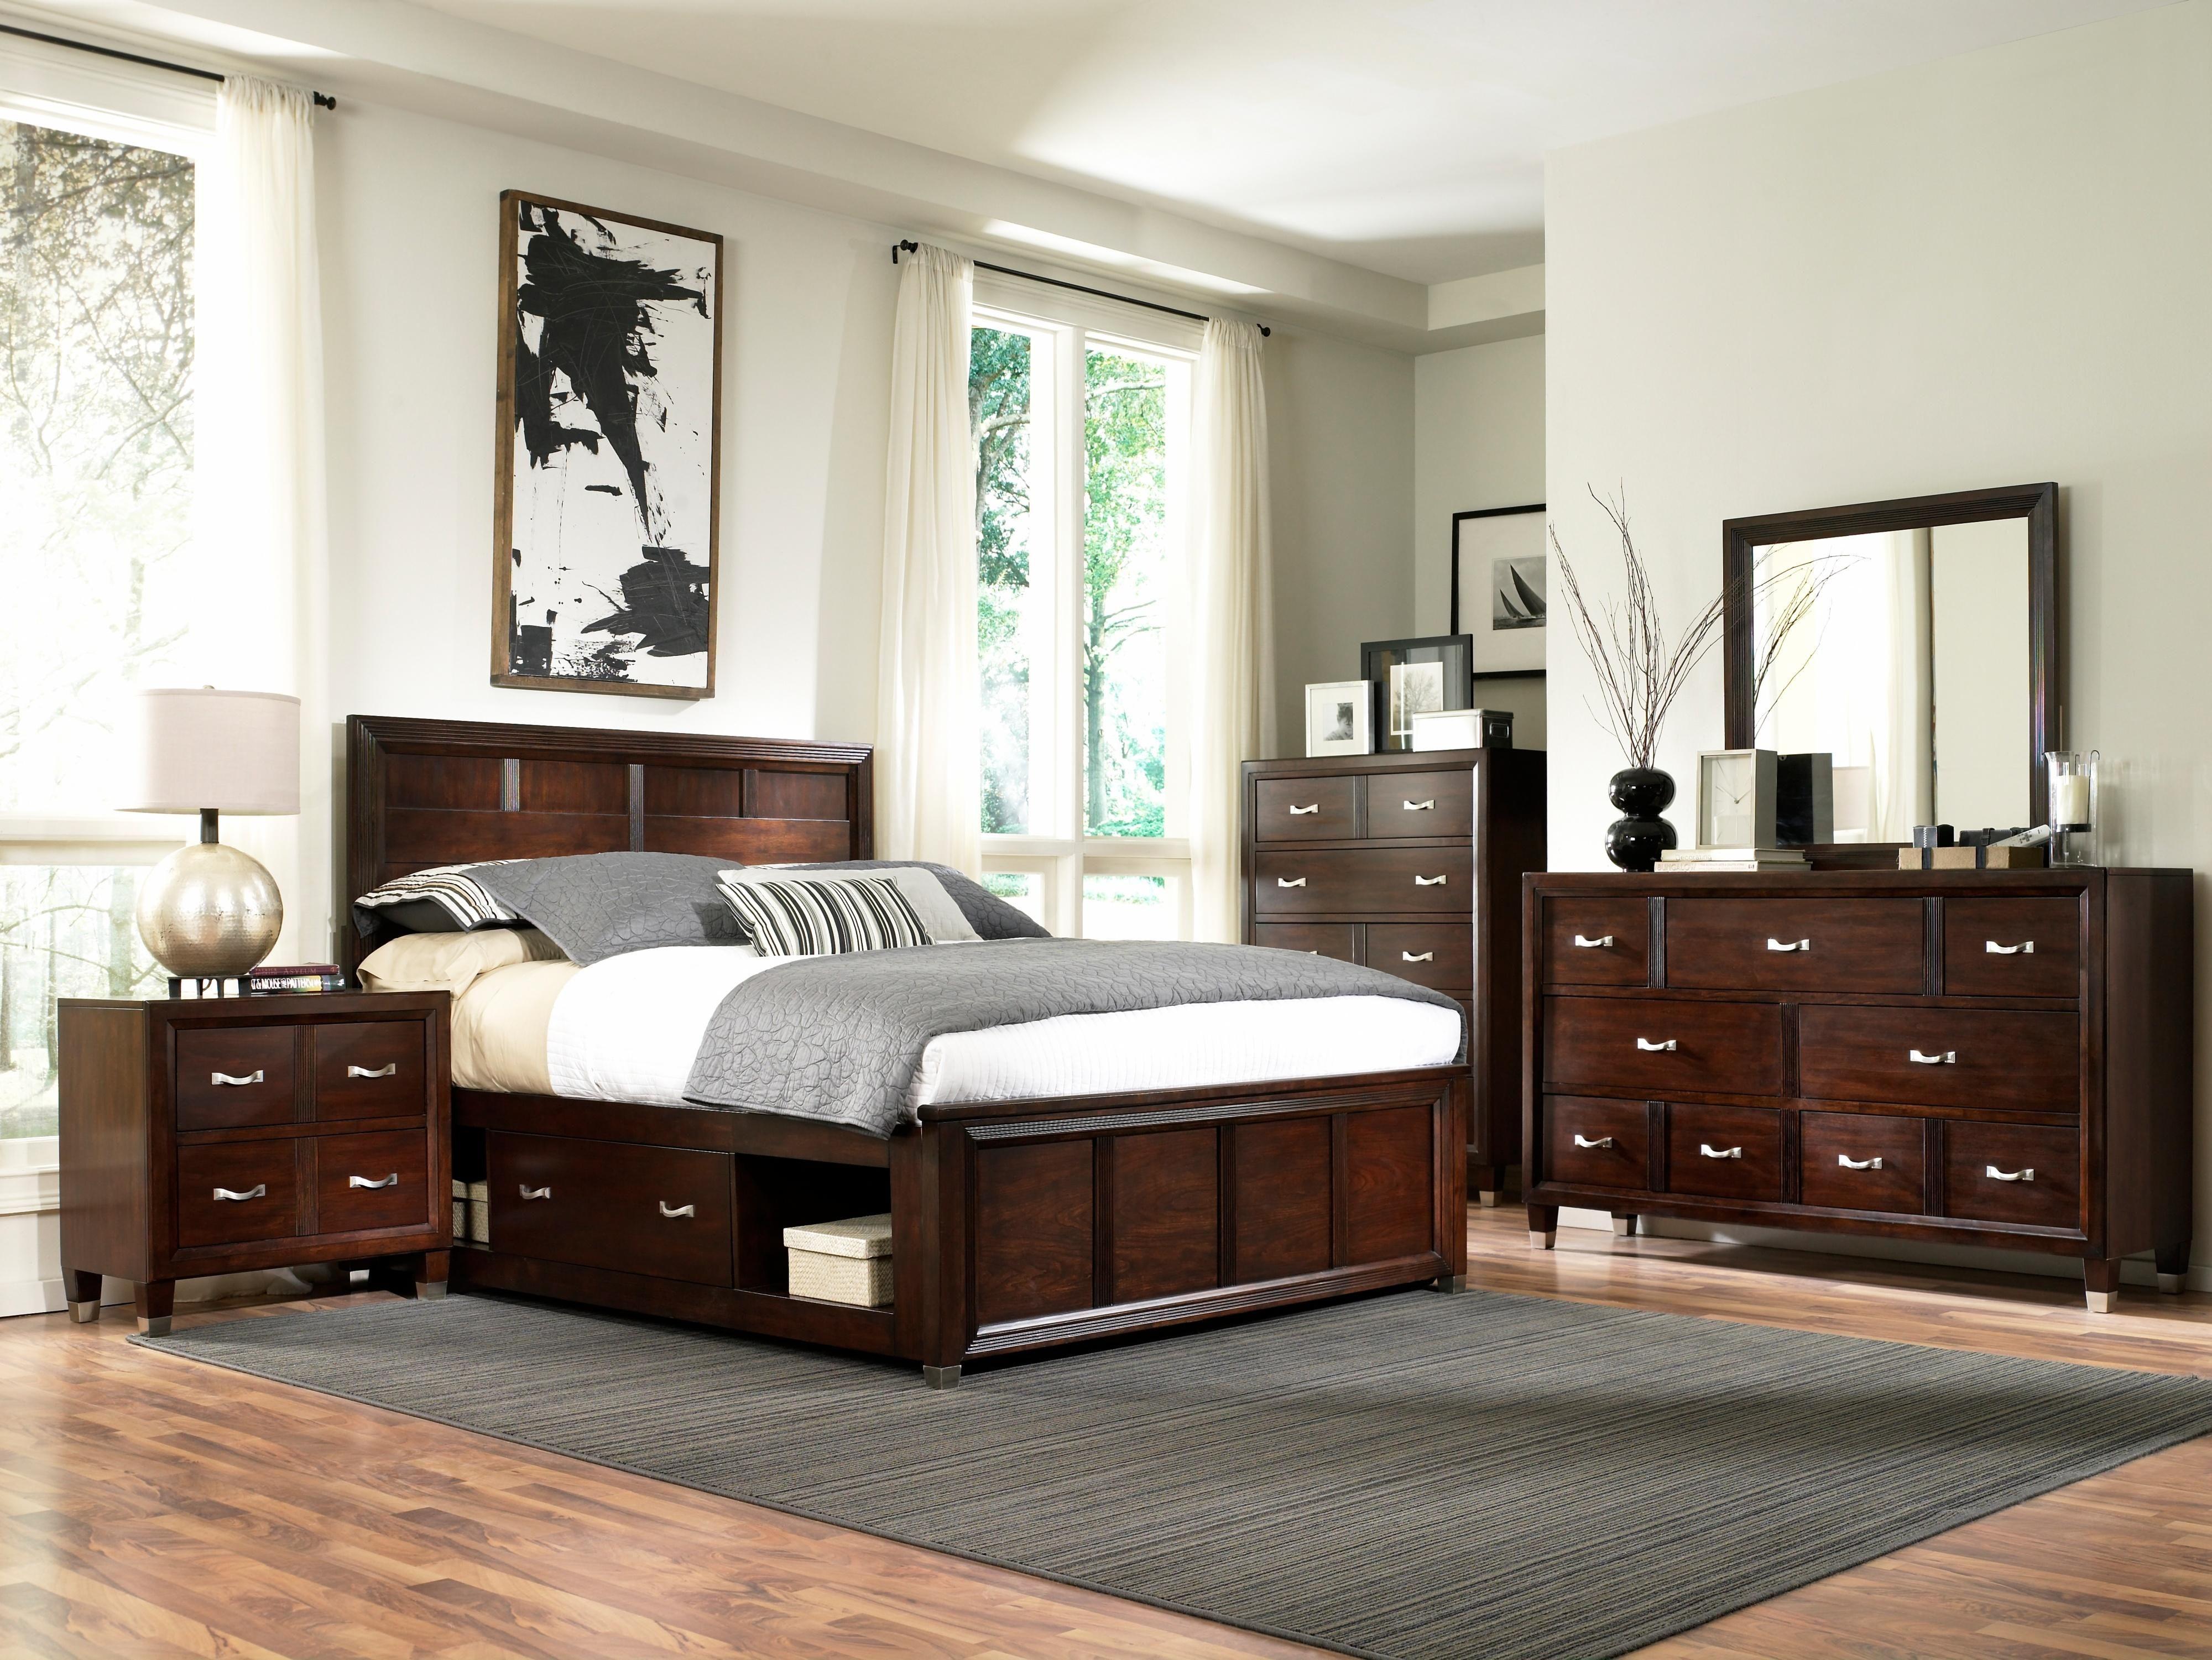 Eastlake 2 California King Bedroom Group By Broyhill Furniture Broyhill Furniture Broyhill Bedroom Furniture Bedroom Sets